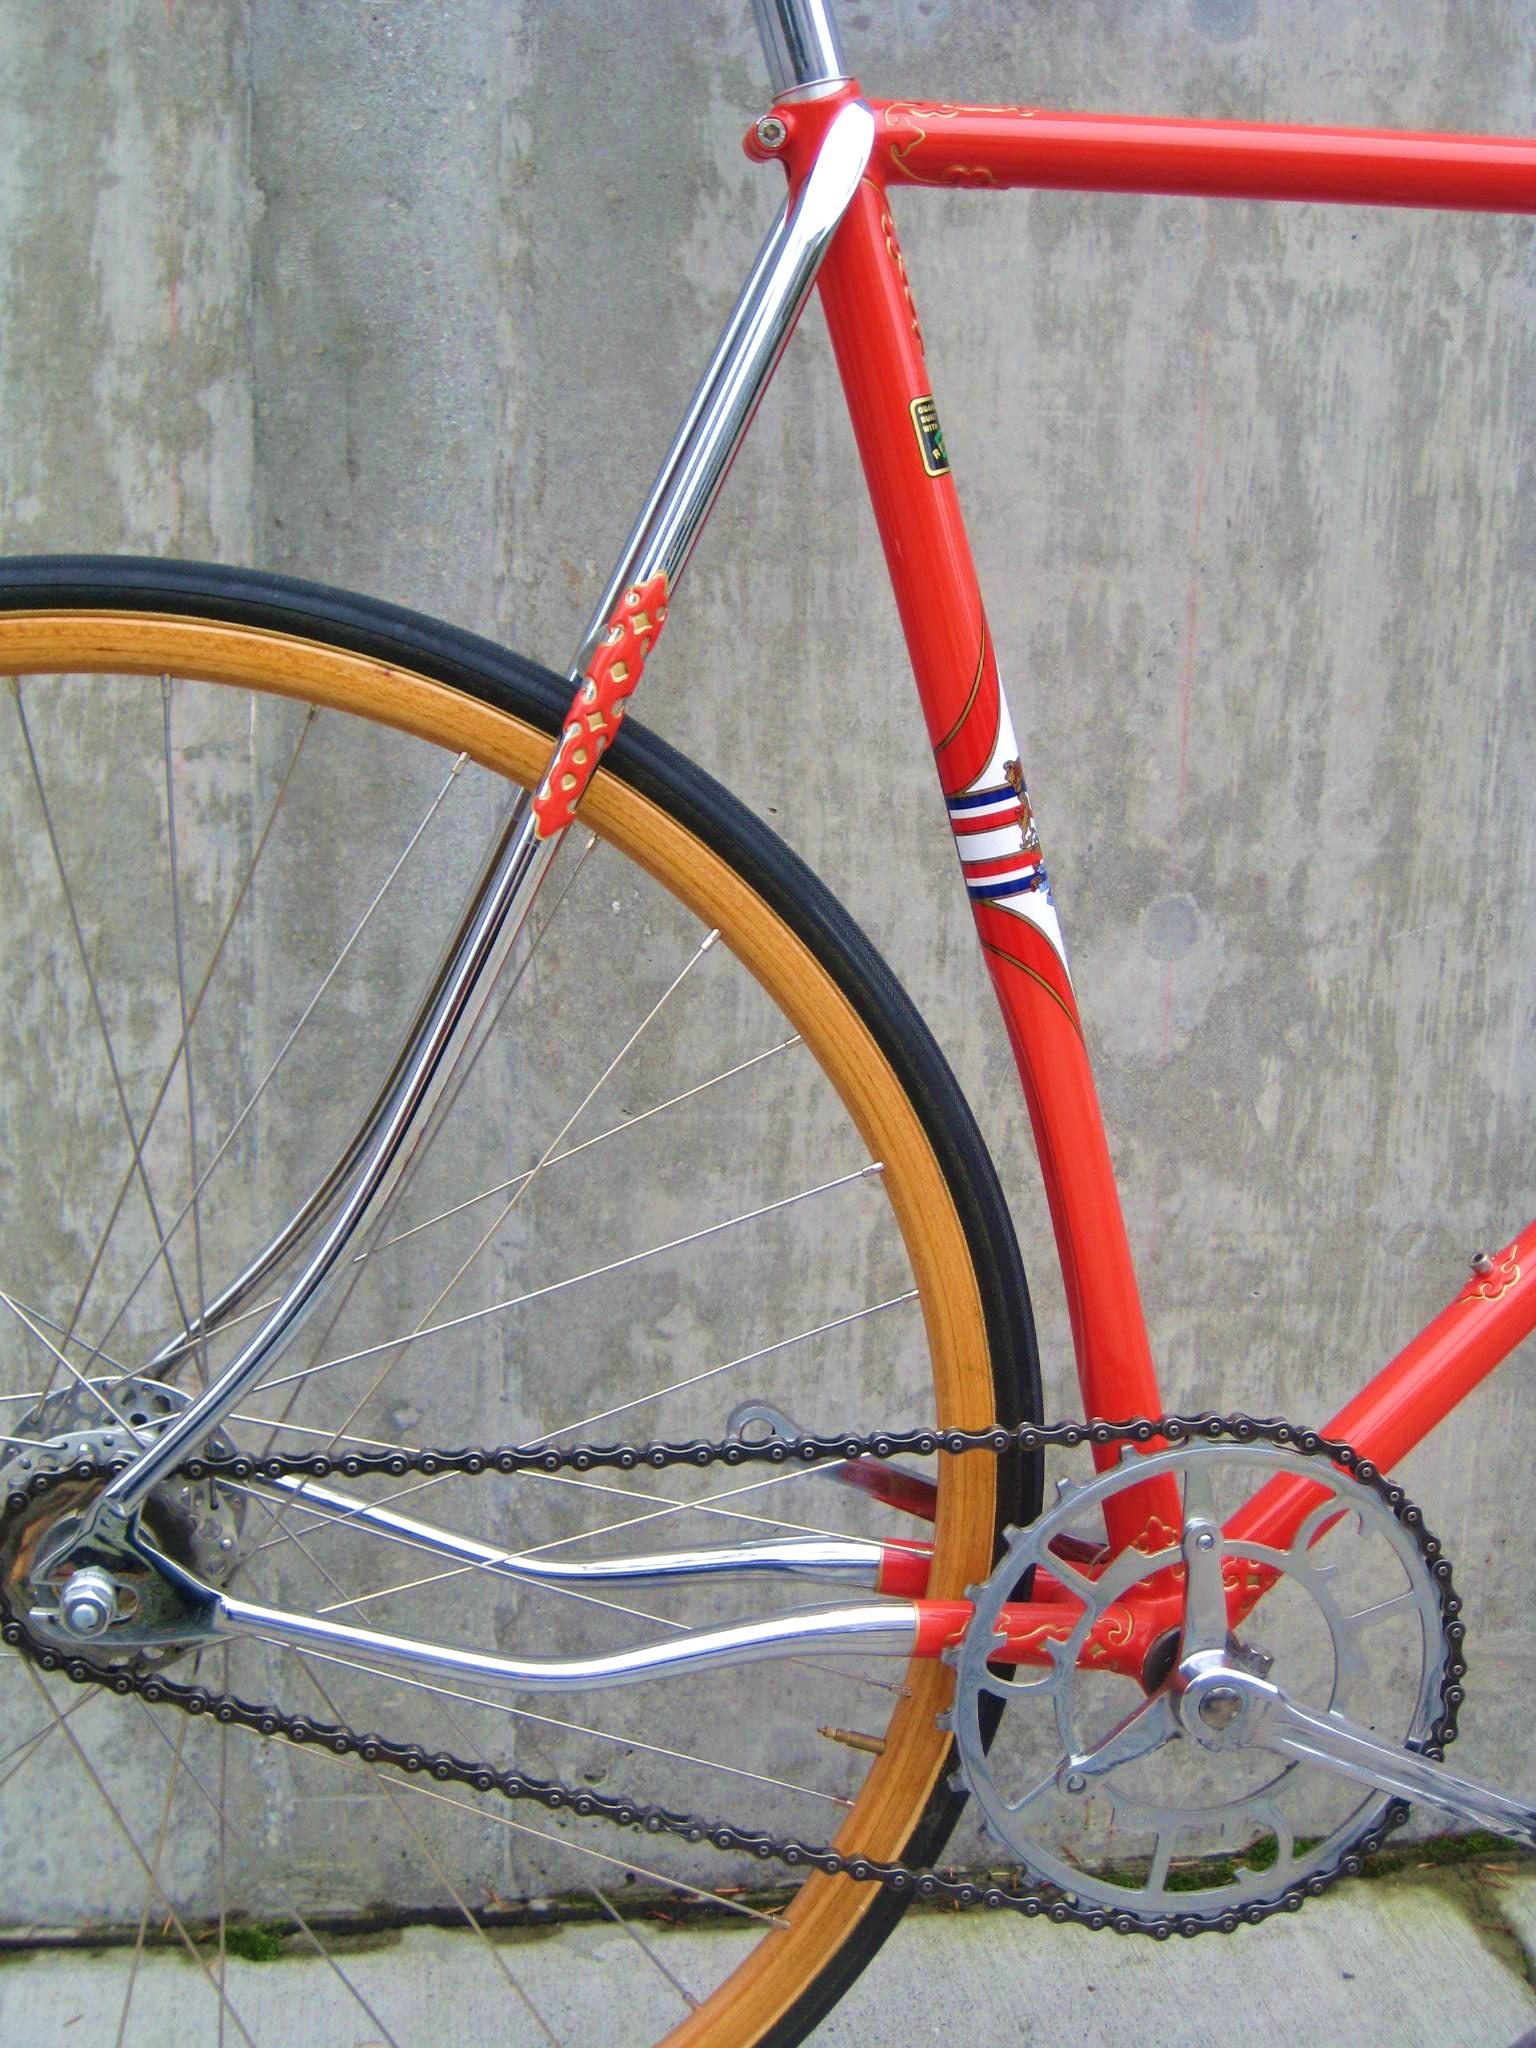 hetchins millenium track bike | Classic Cycle Bainbridge ...